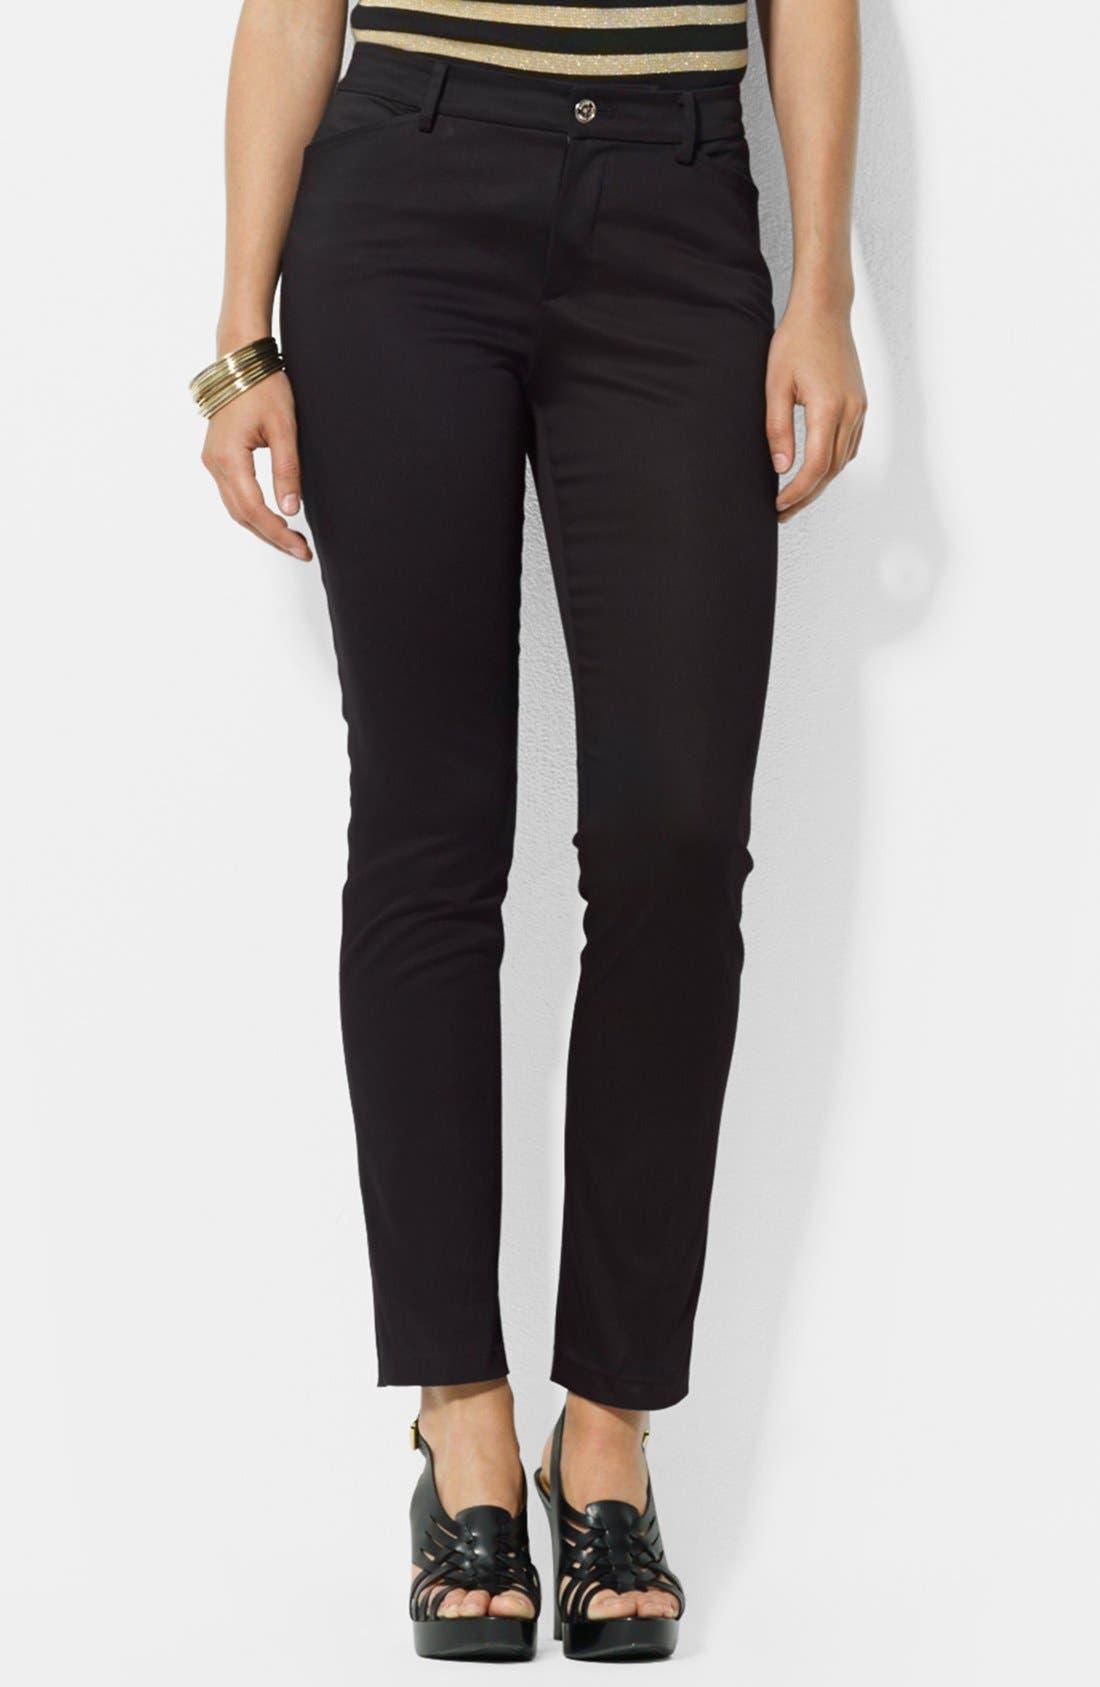 Main Image - Lauren Ralph Lauren Stretch Sateen Ankle Pants (Petite)